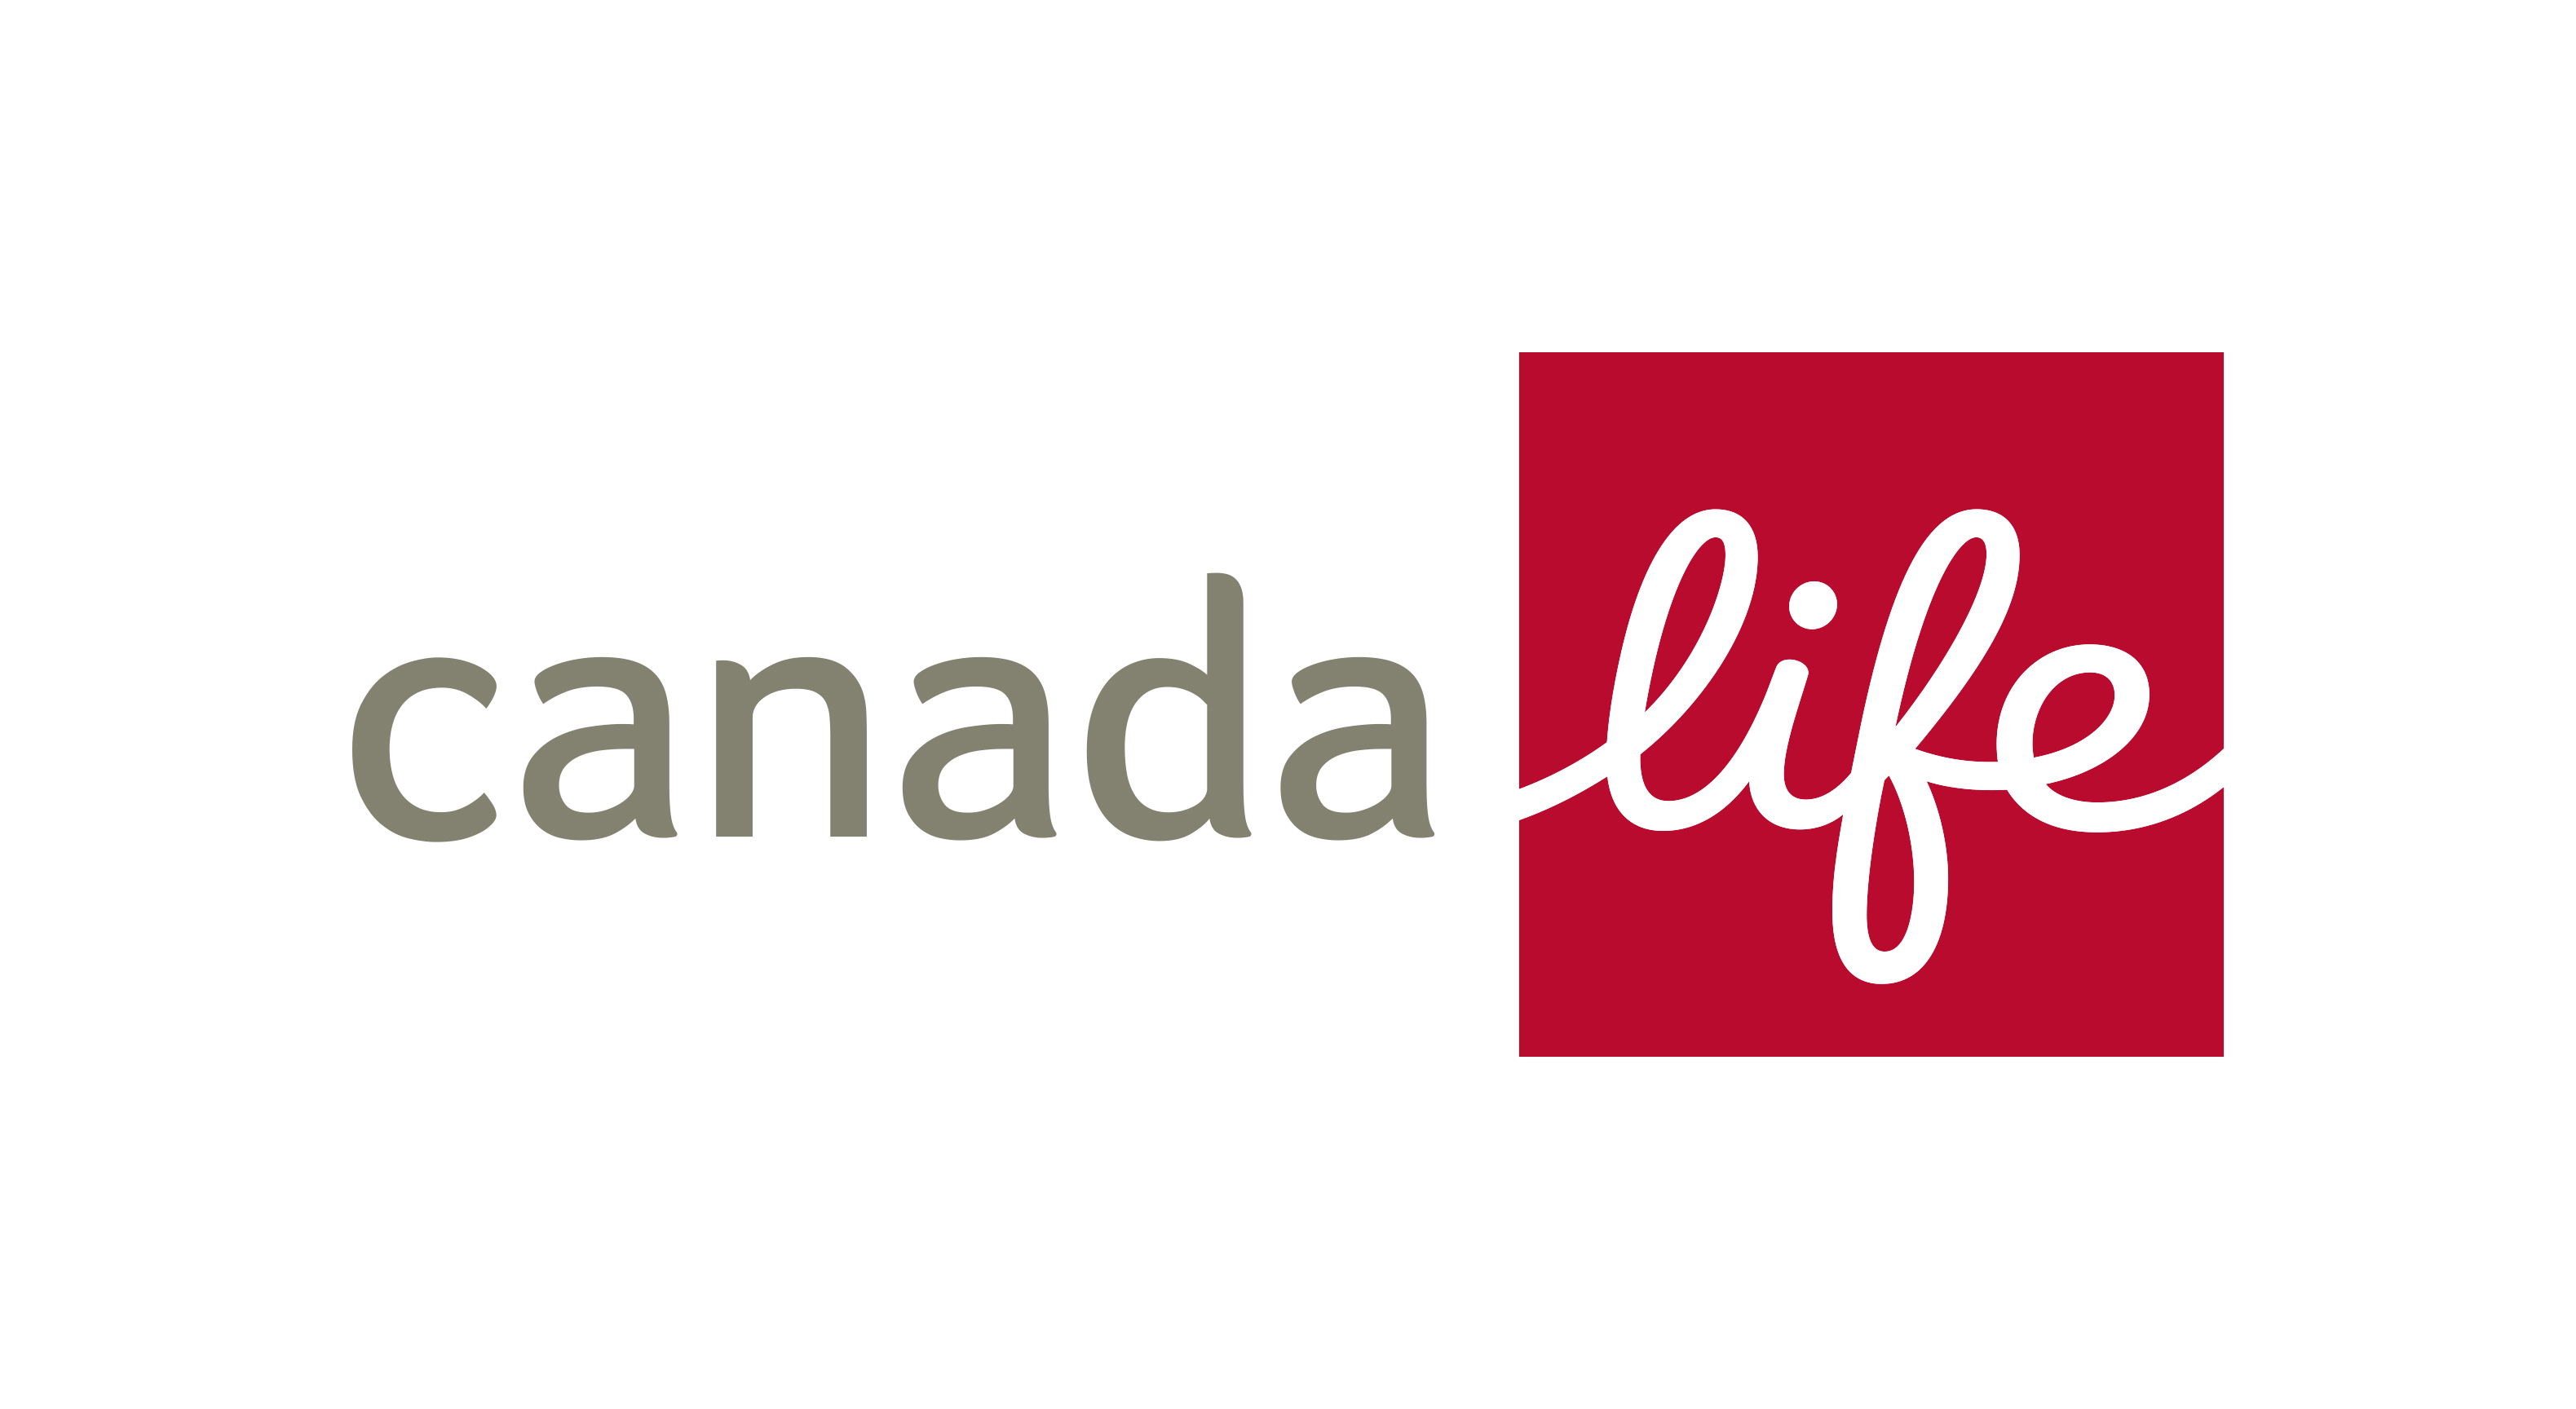 CanadaLife_E_rgb.jpg (537 KB)